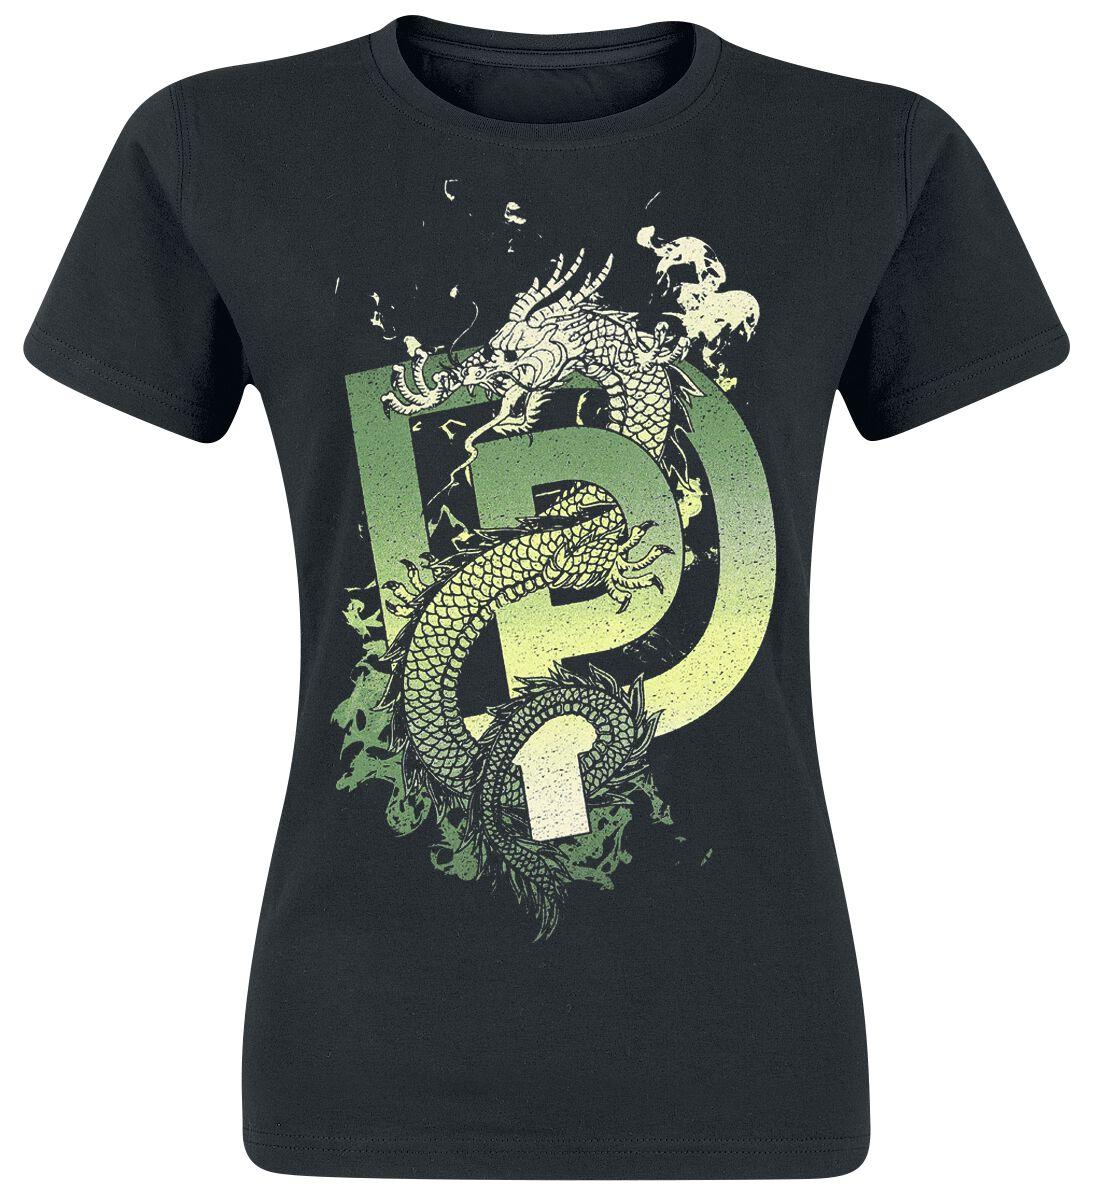 Zespoły - Koszulki - Koszulka damska Deep Purple Dragon Koszulka damska czarny - 356901